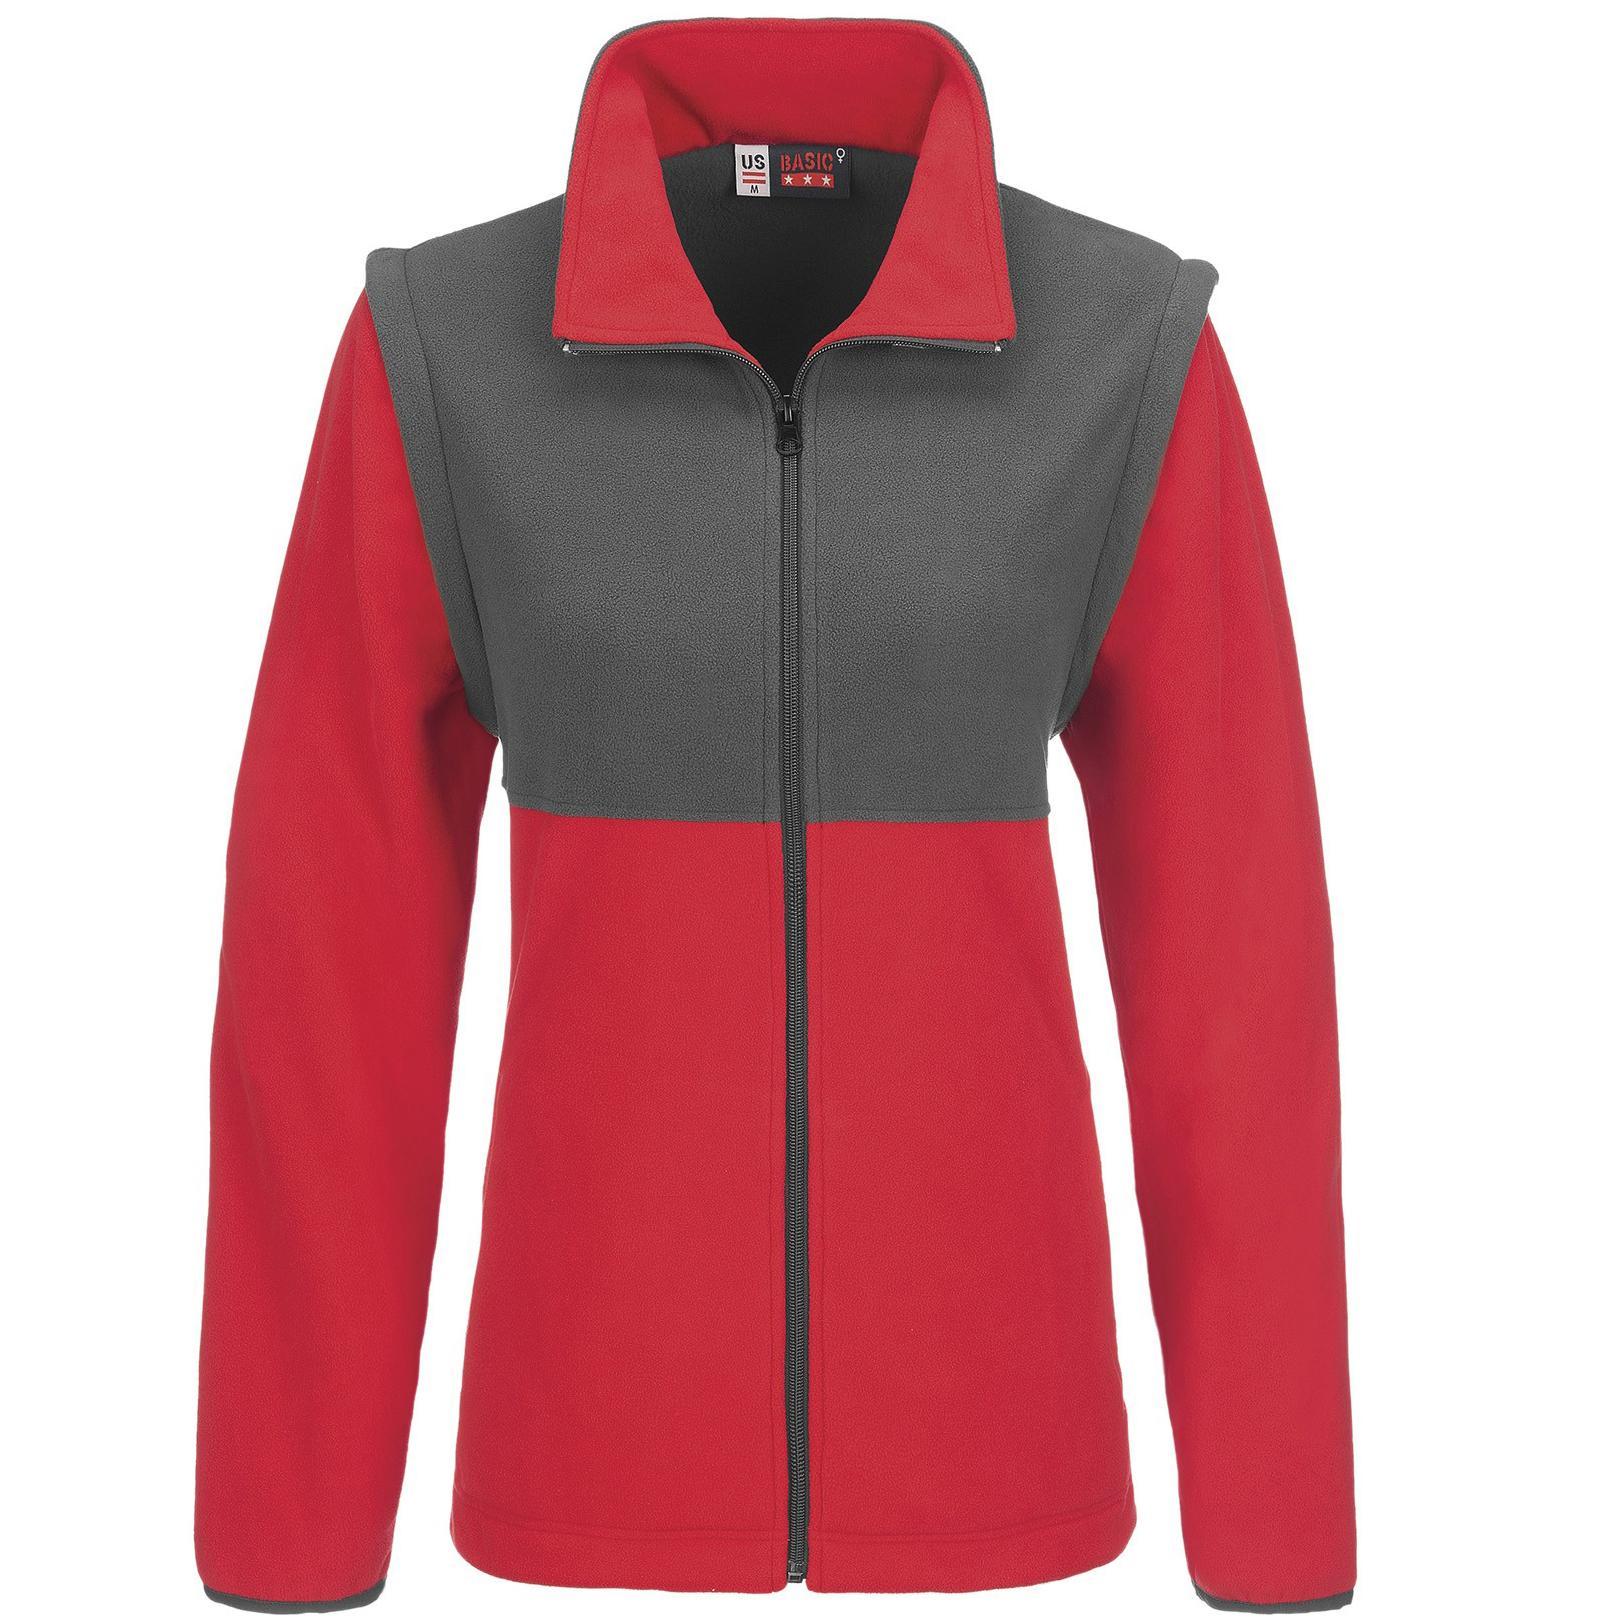 Ladies Benneton Zip-off Micro Fleece Jacket - Red Only